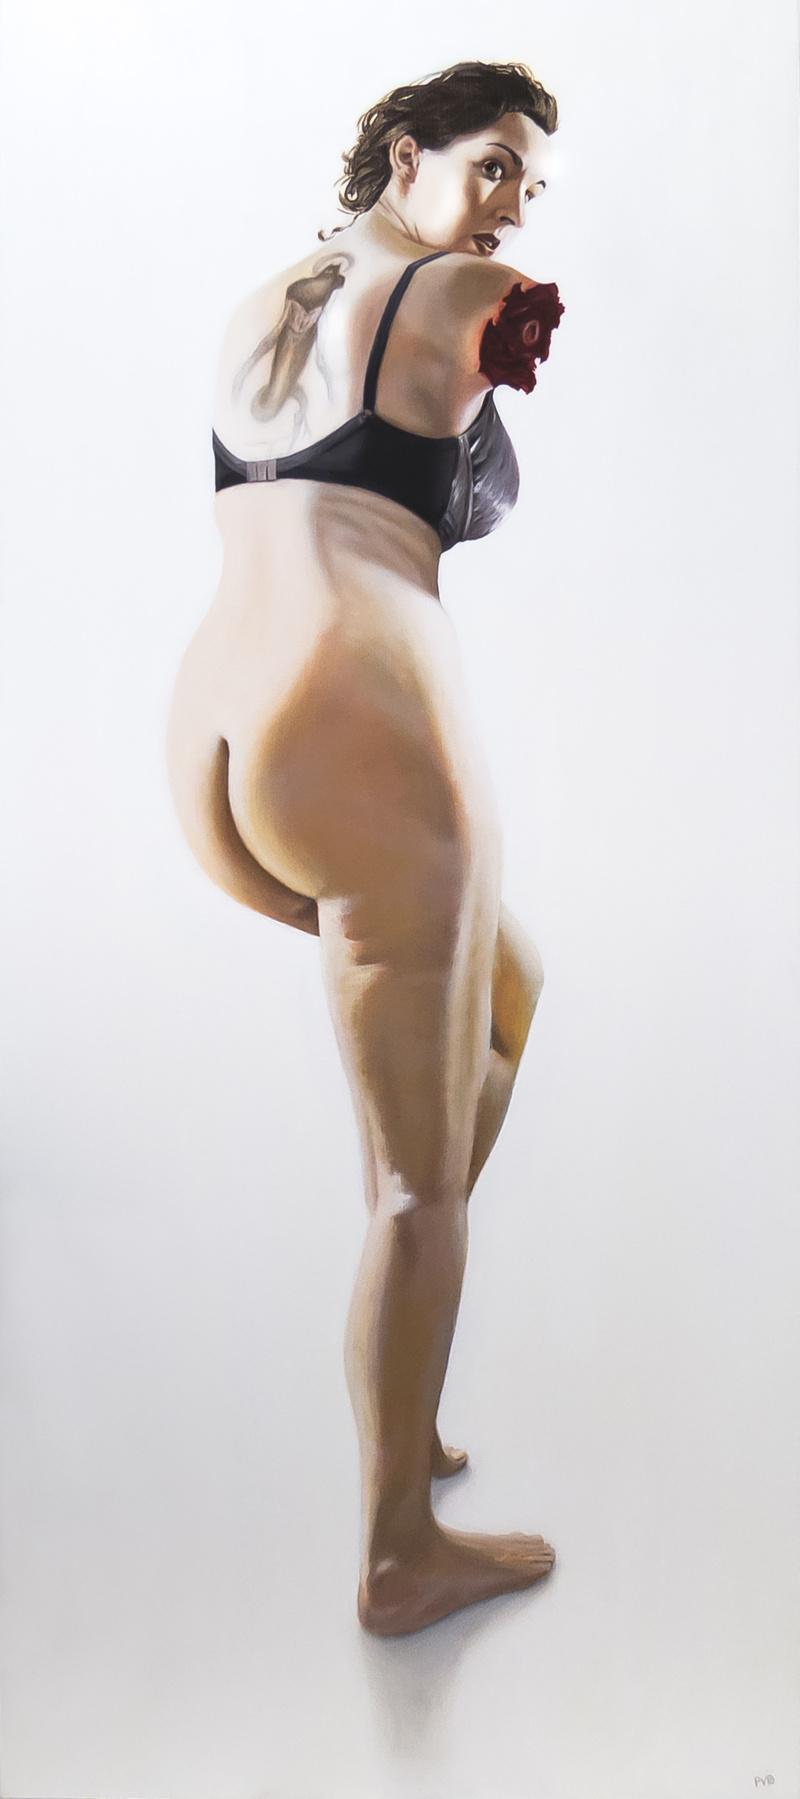 Male model photo shoot of philrabovsky